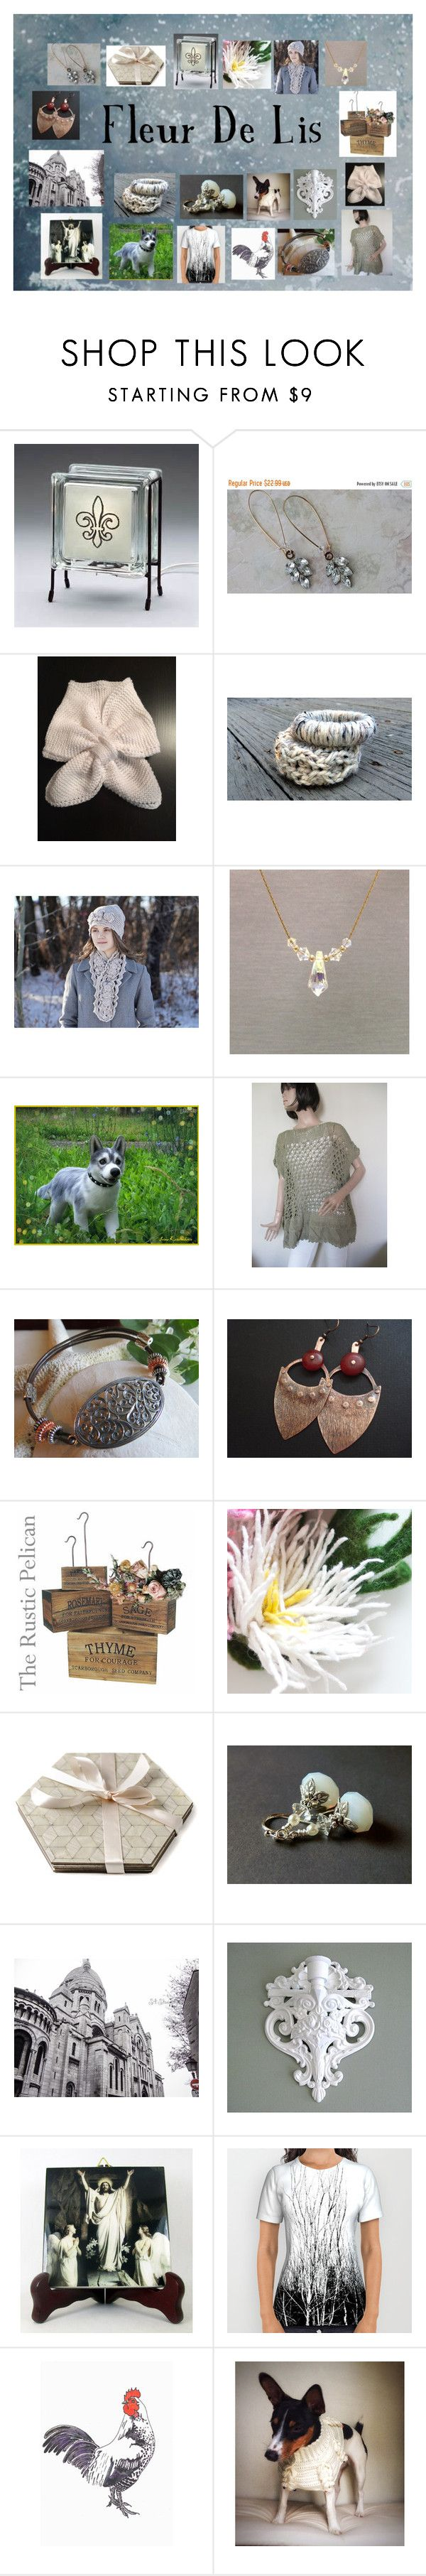 Fleur De Lis: Elegant Etsy Finds by paulinemcewen on Polyvore featuring moda